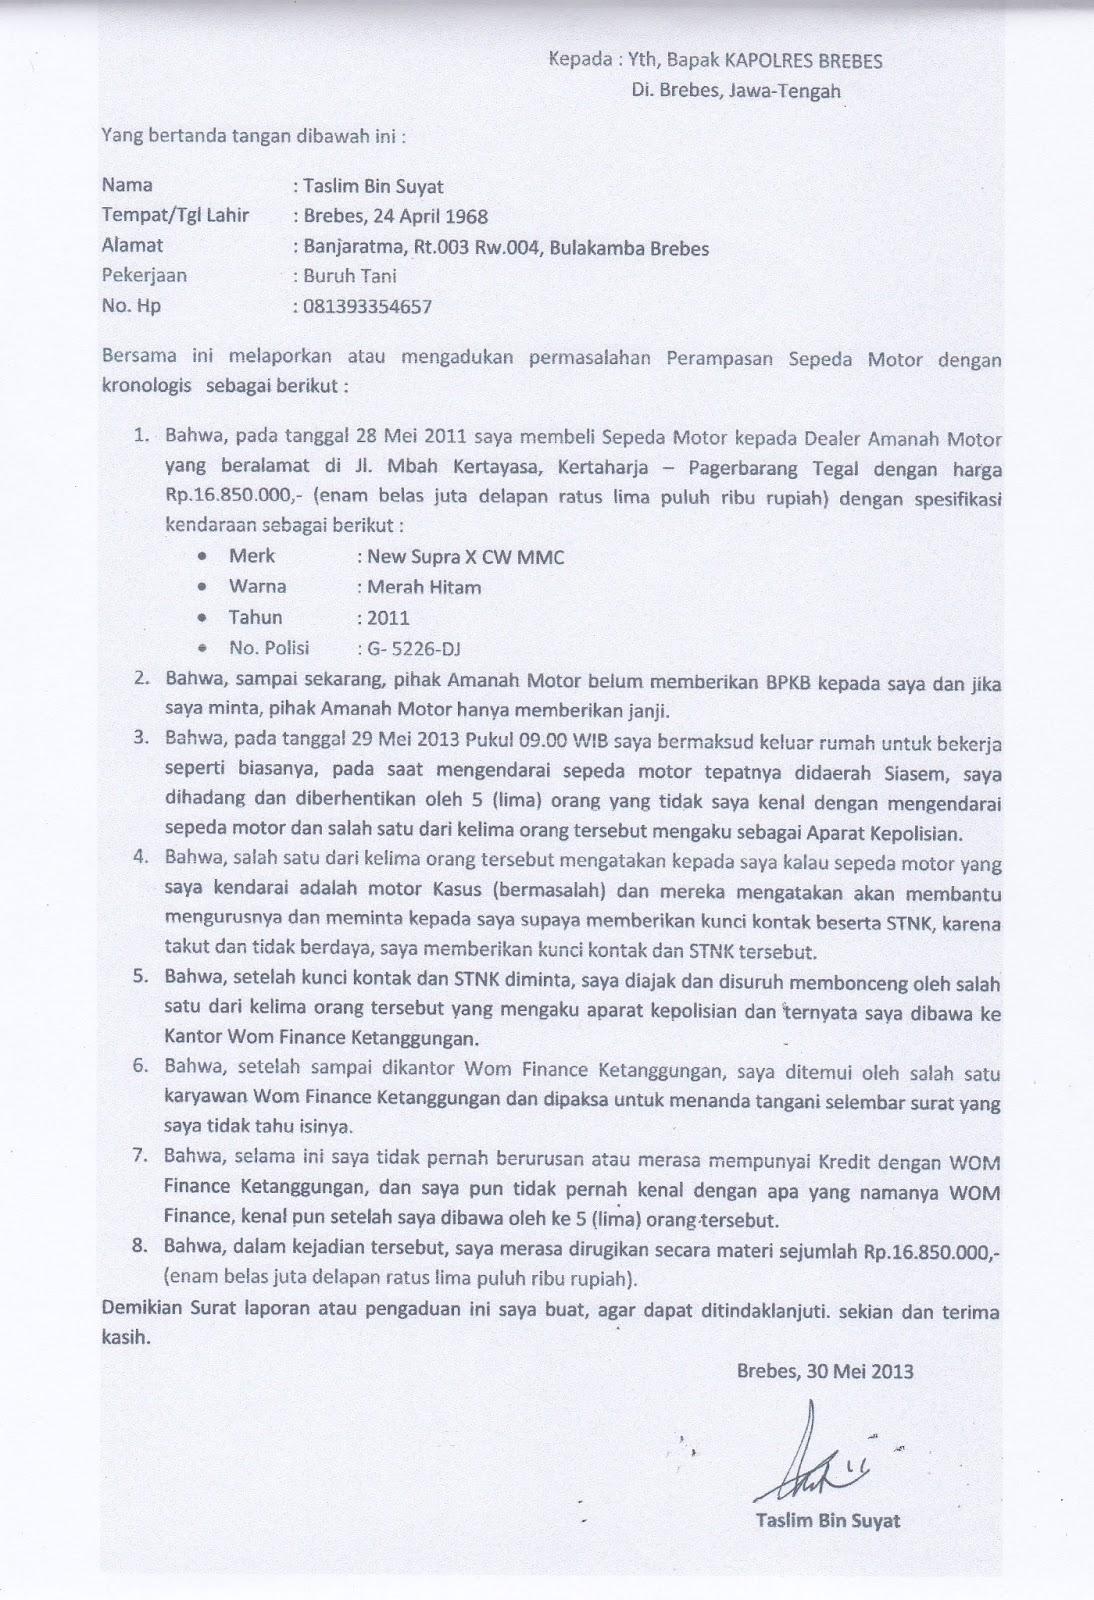 17 Contoh Surat Pengaduan Atas Pencemaran Nama Baik